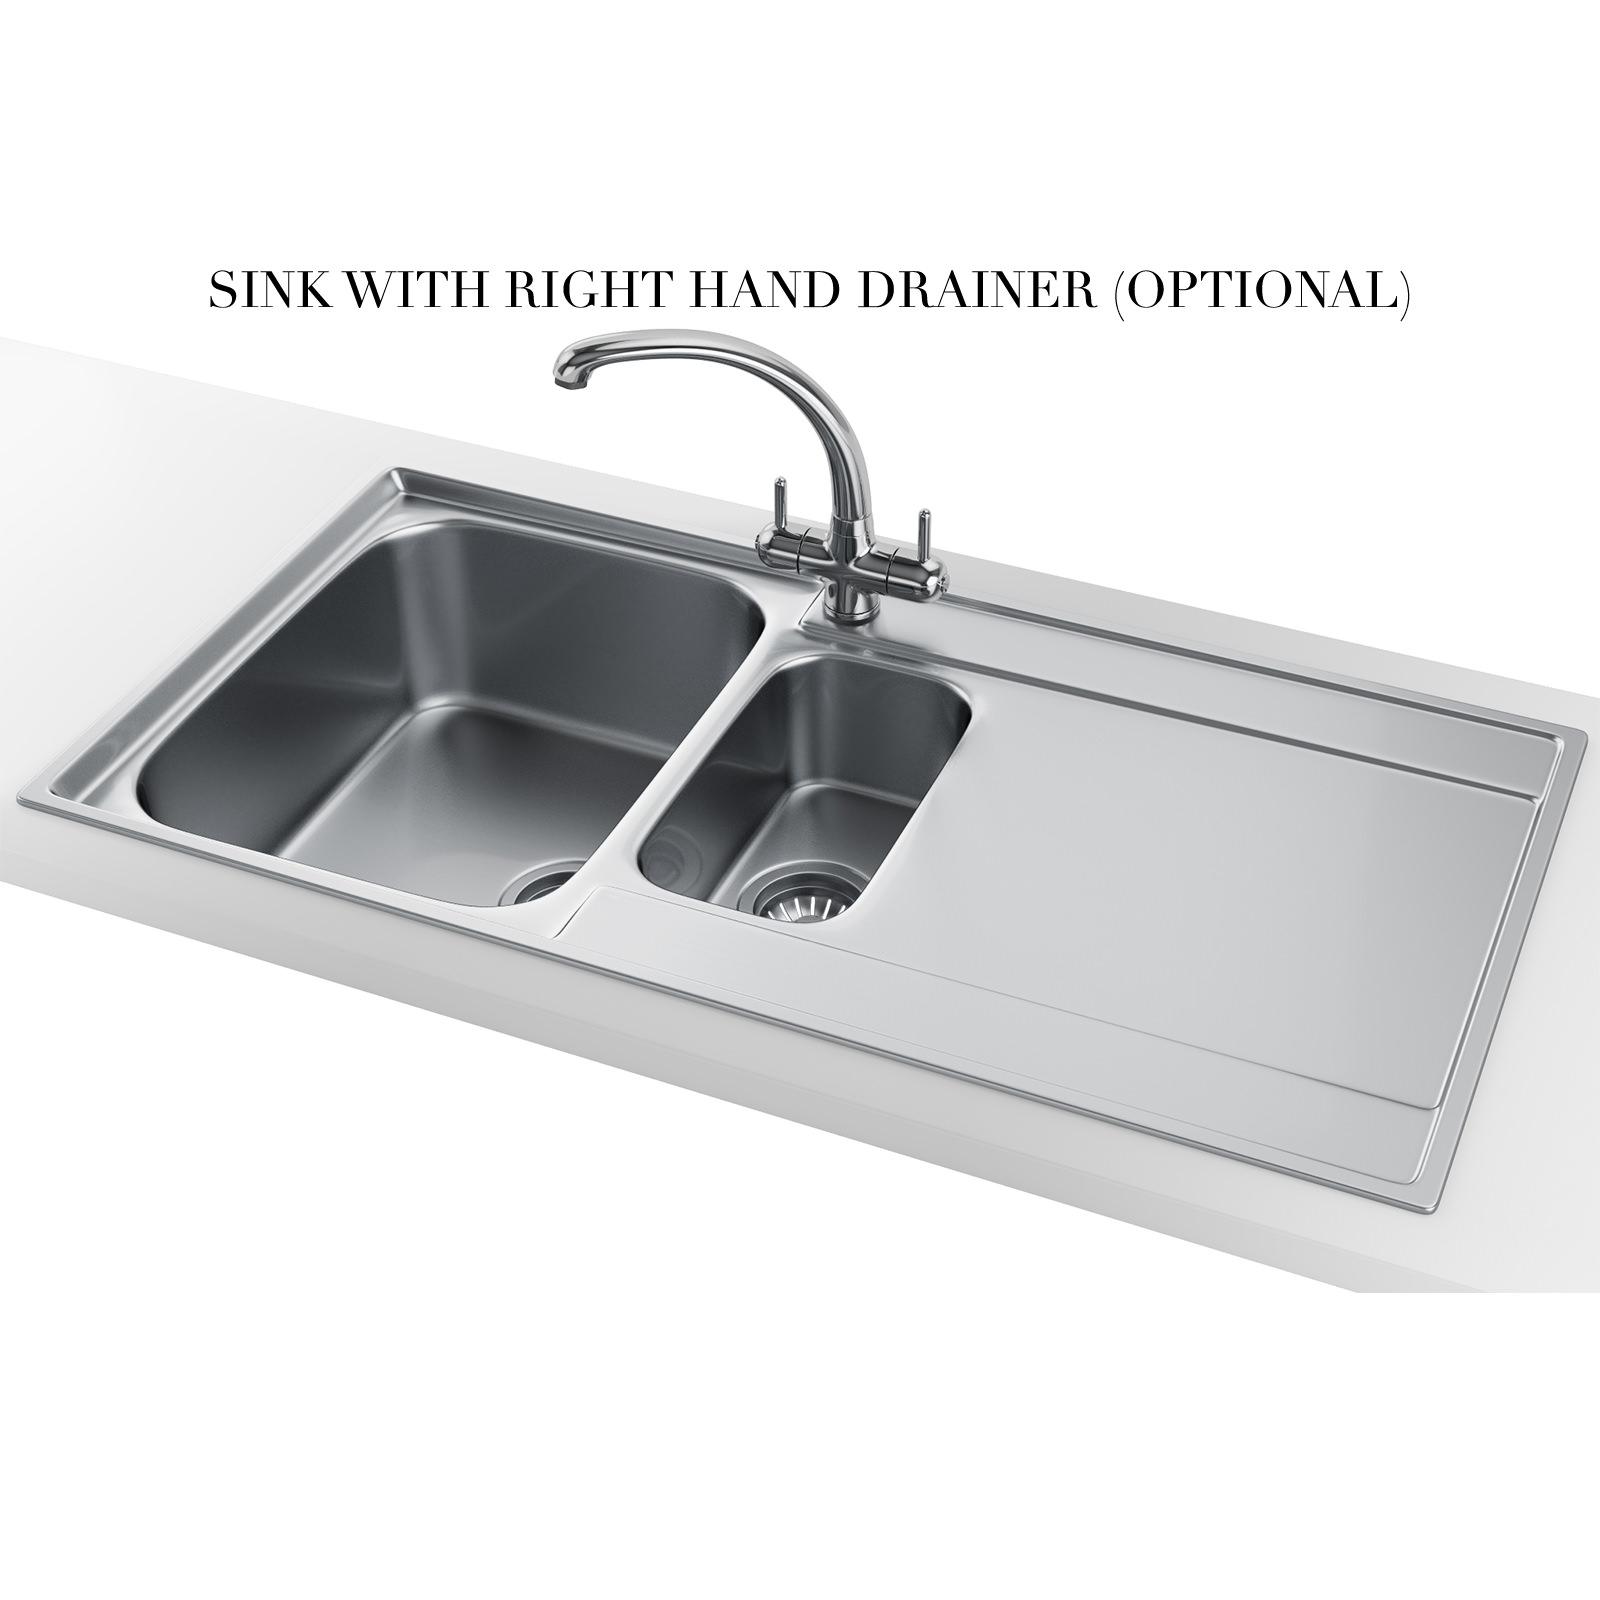 Franke maris slim top mrx 251 stainless steel 1 5 bowl for Franke sinks